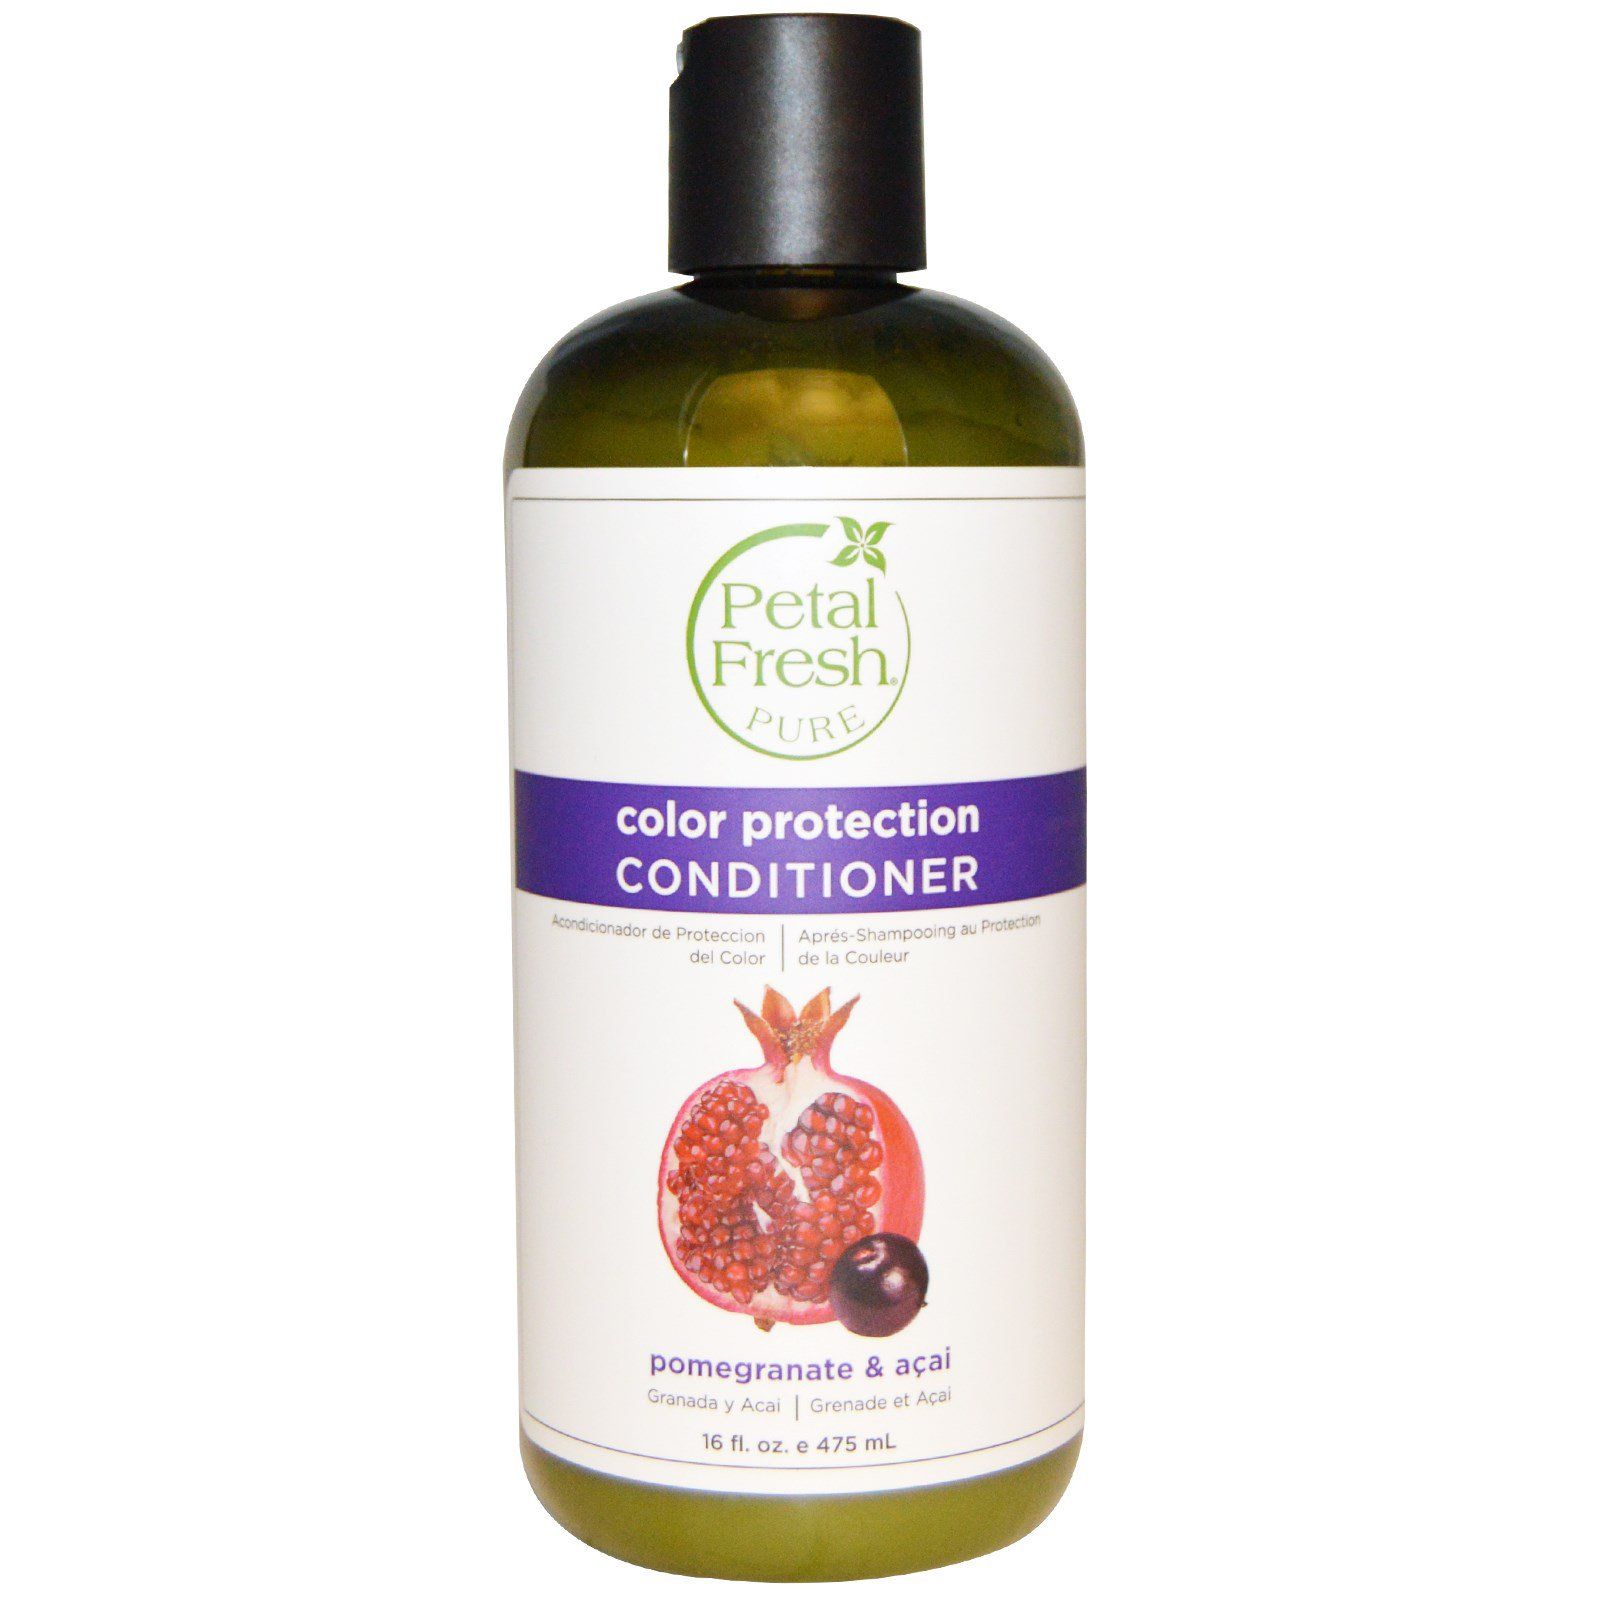 Petal Fresh, Pure, Conditioner, Color Protection, Pomegranate and Acai, 16 fl oz (475 ml)